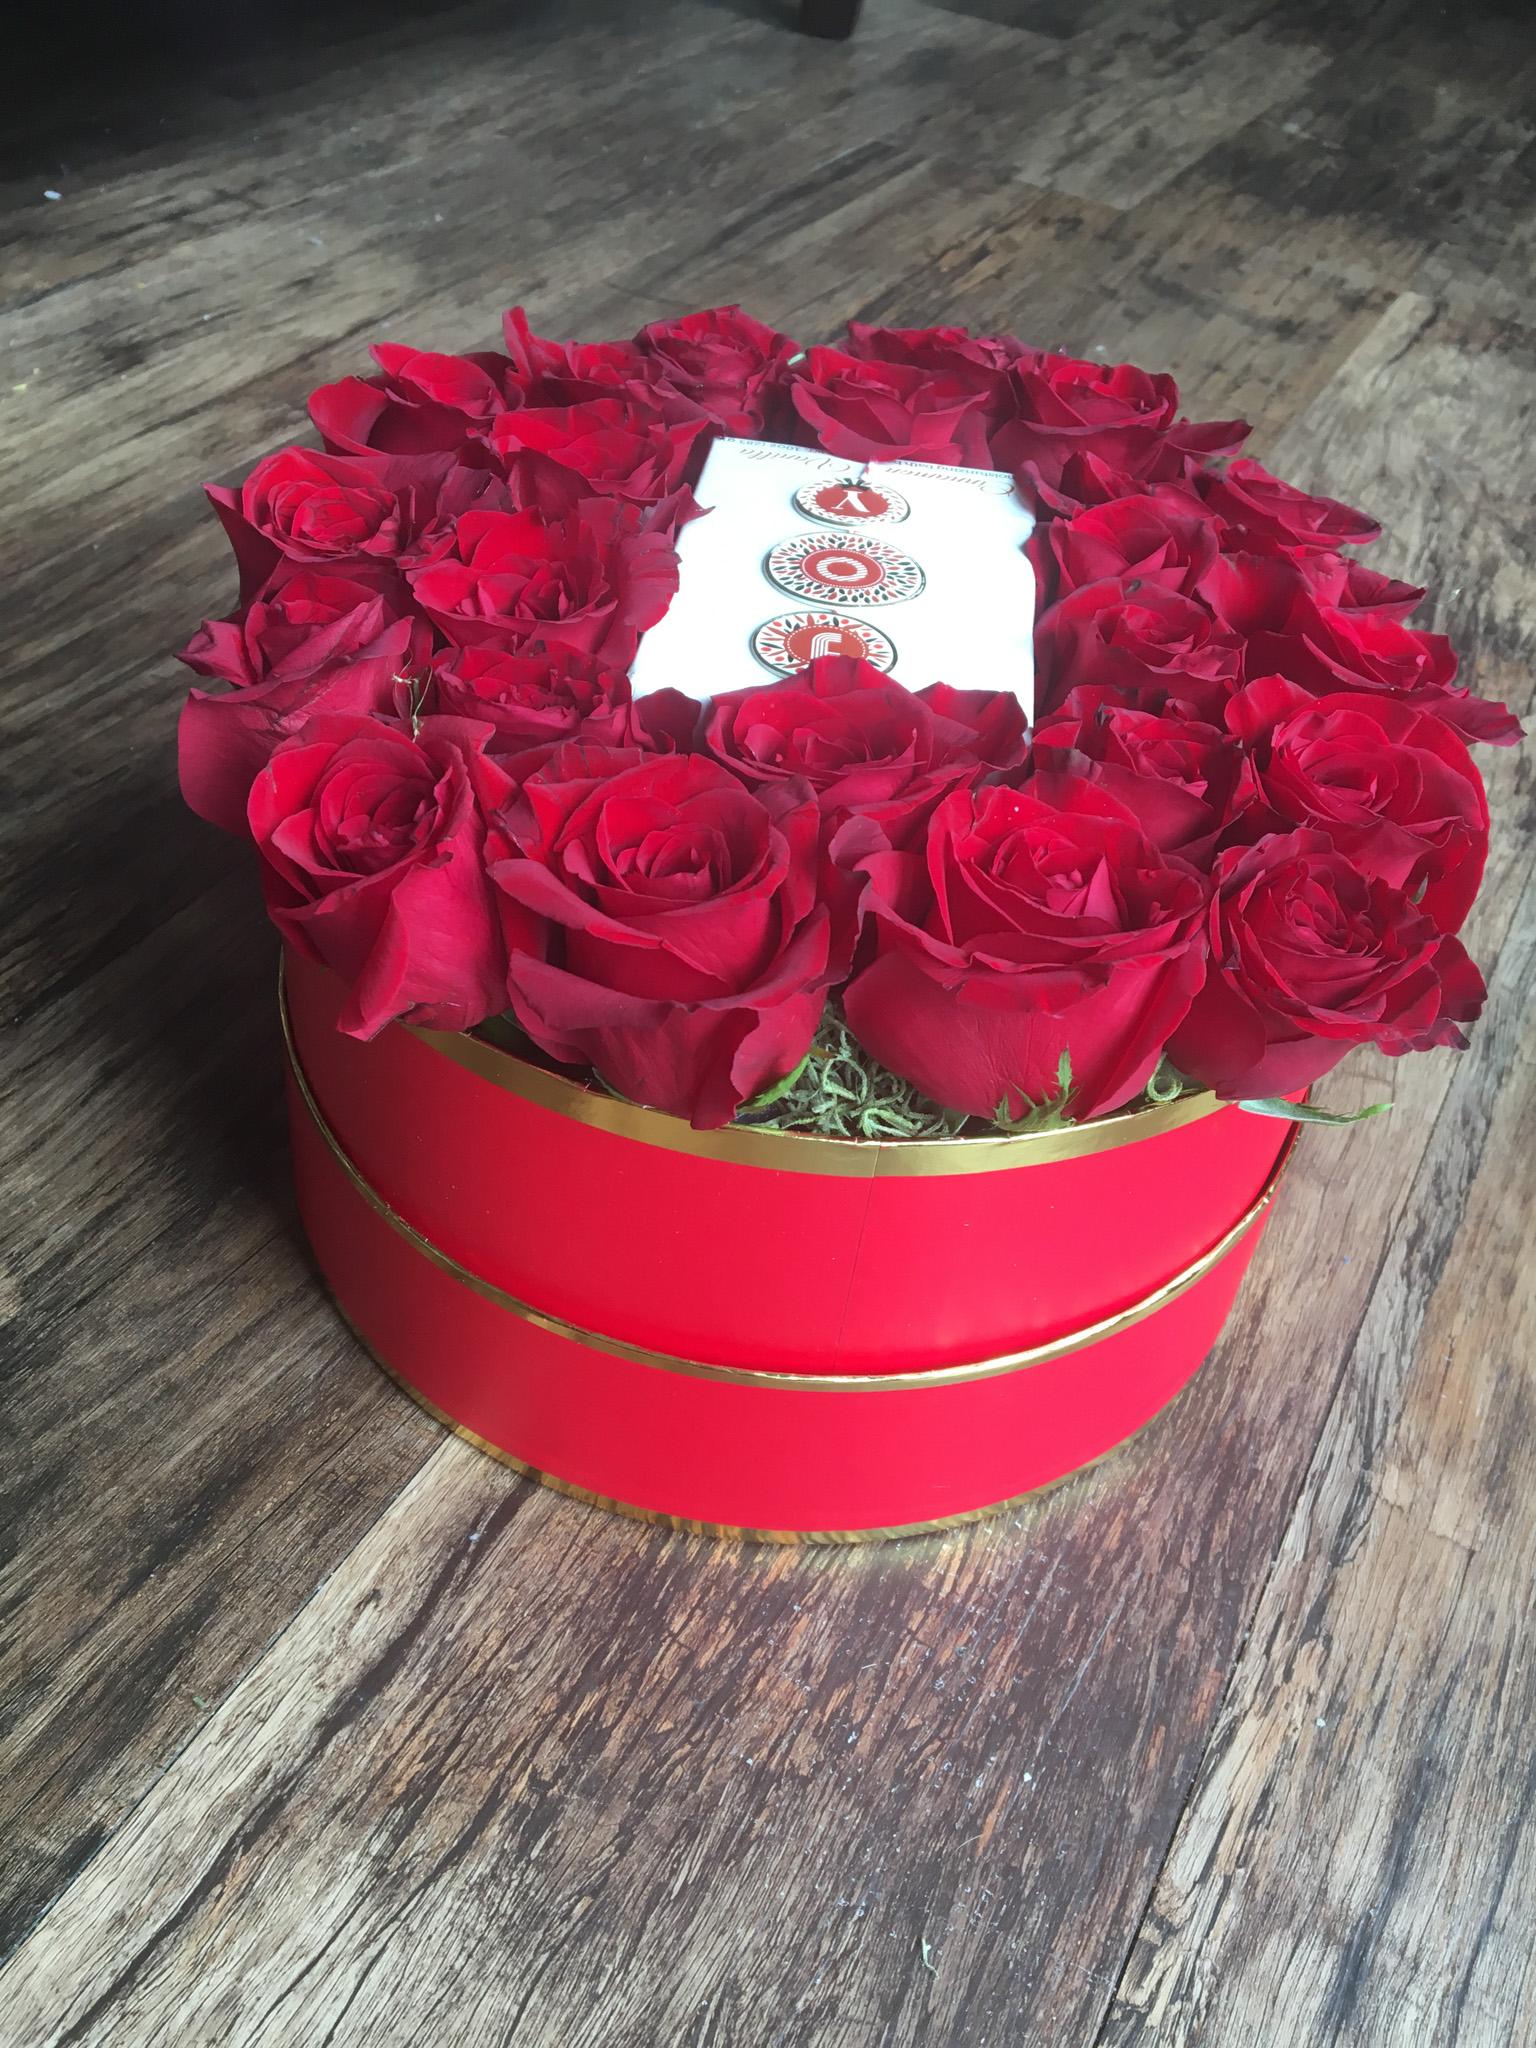 redroses_roundbox_gift1.jpg